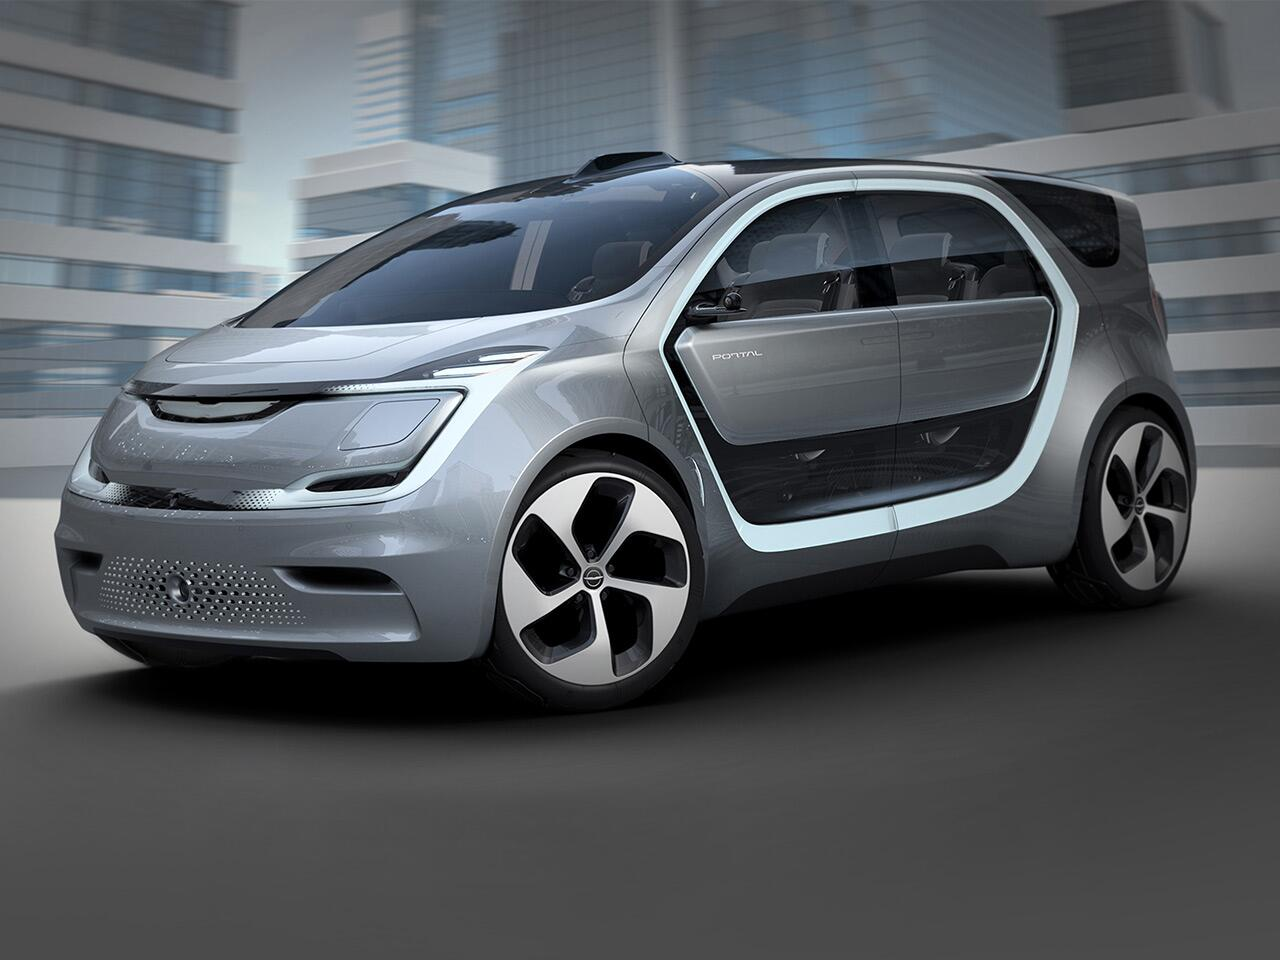 Bild zu Chrysler Portal Concept